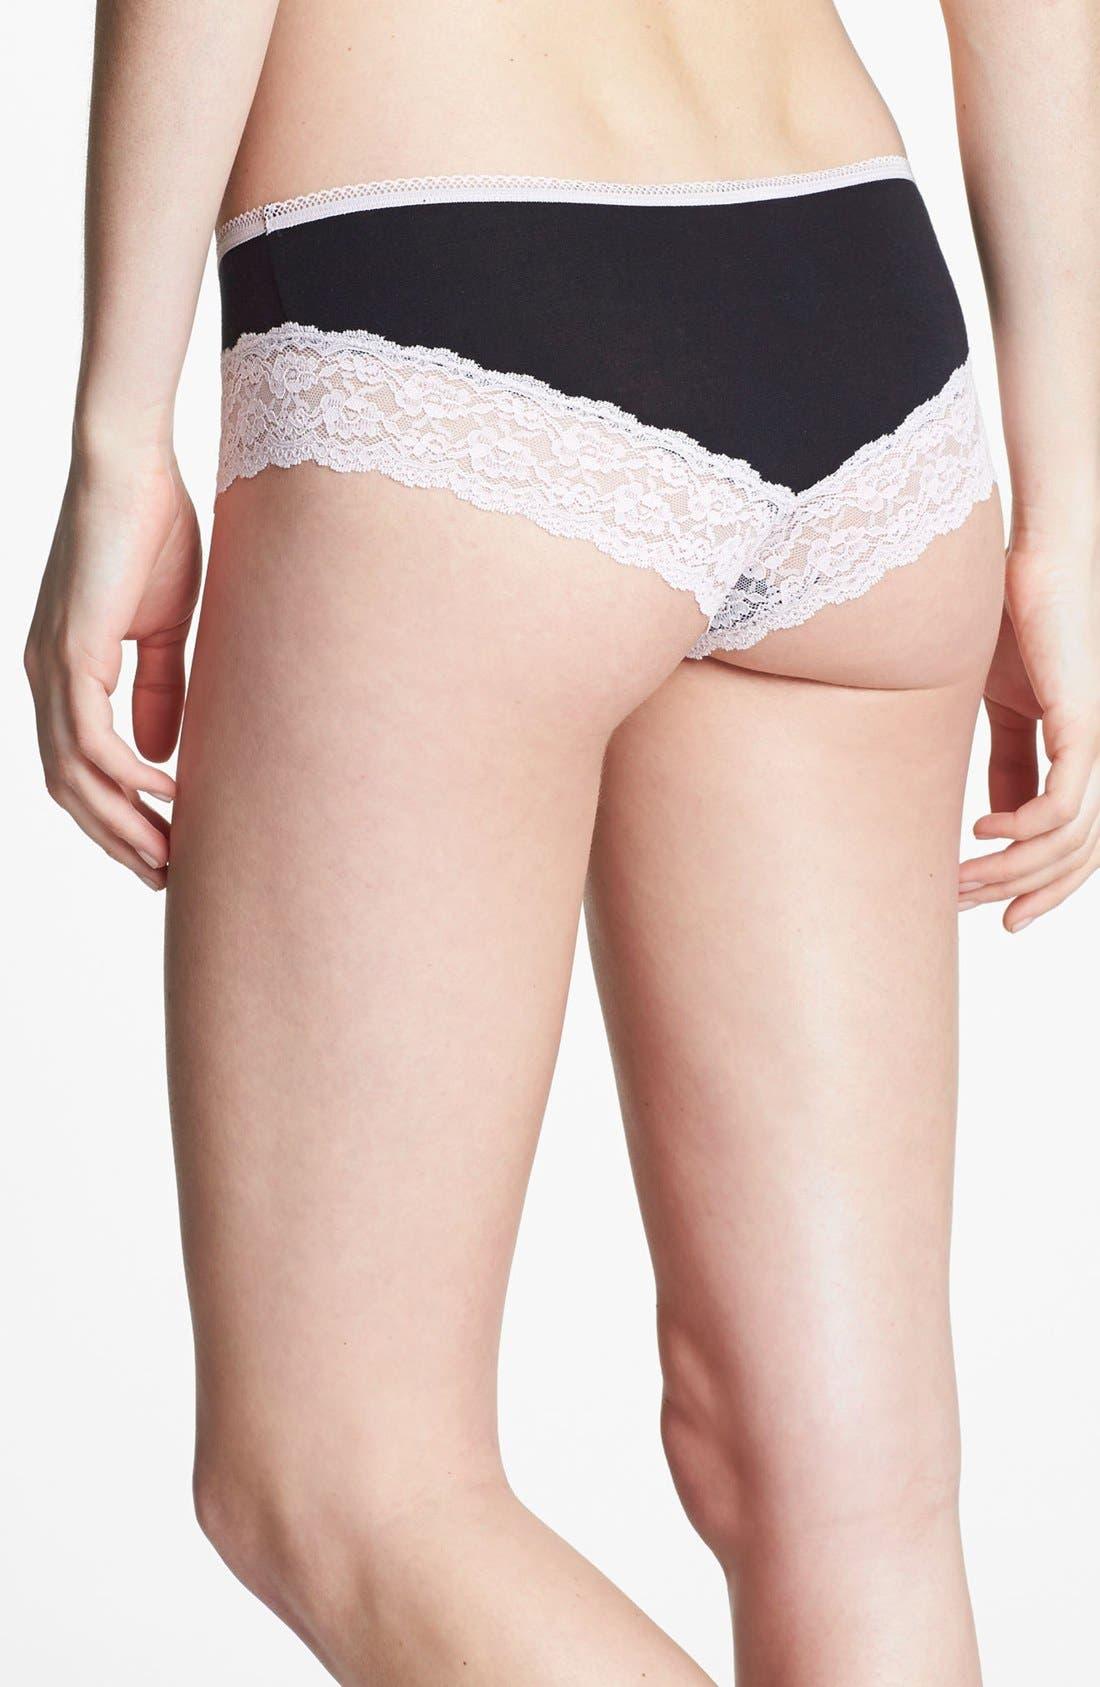 Alternate Image 2  - b.tempt'd by Wacoal 'Super Natural' Bikini (3 for $30)